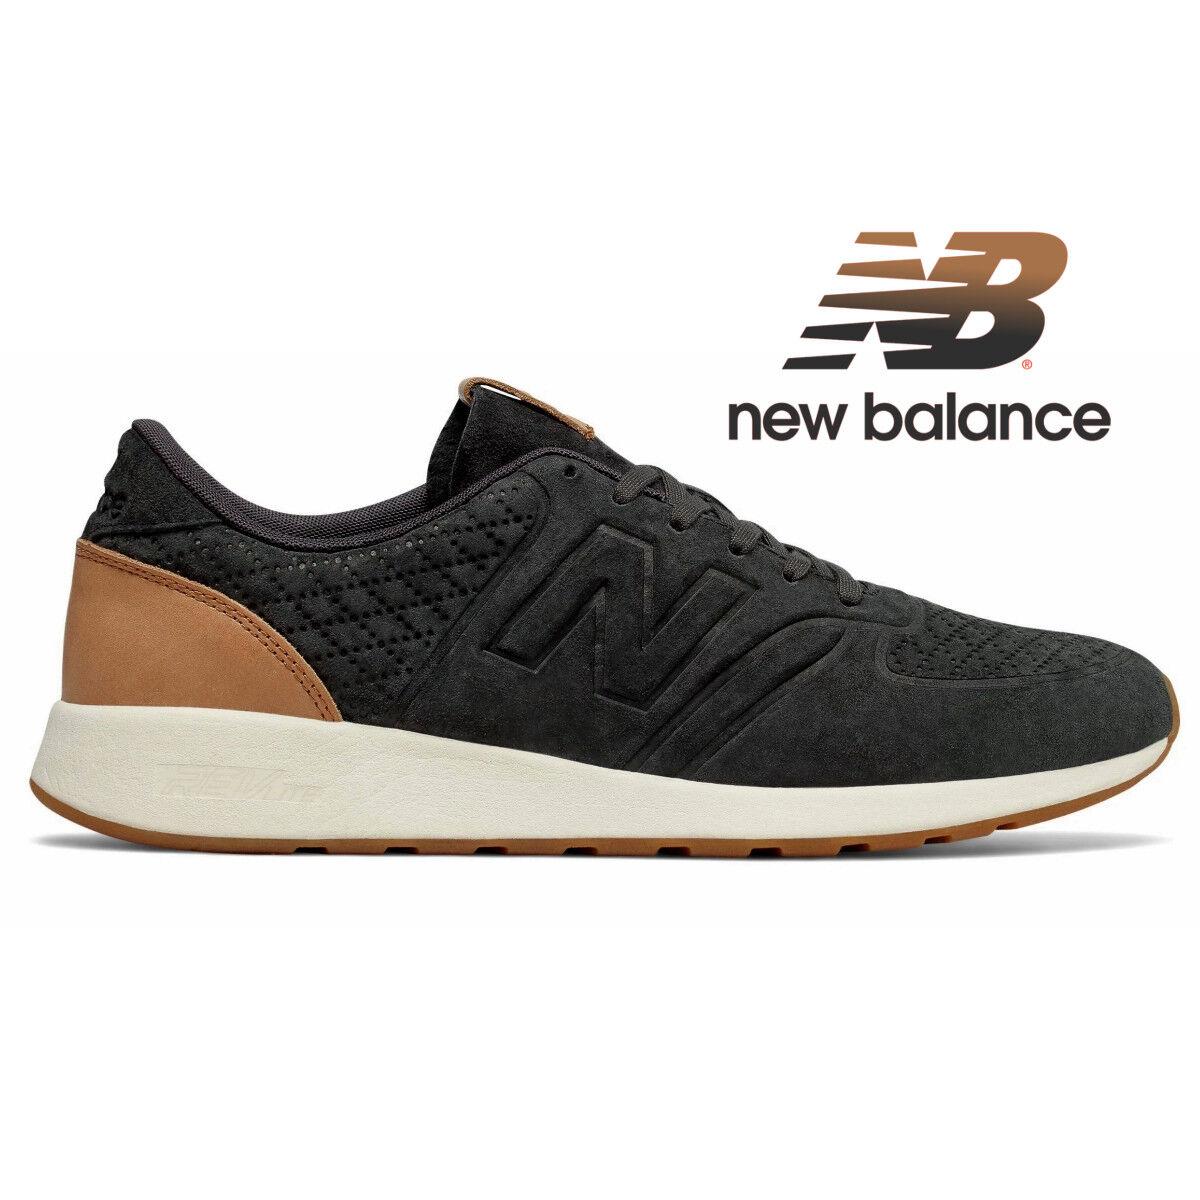 New 450 correr para hombres zapatos para correr 450 Balance Zapatillas Nuevas 2a54c0